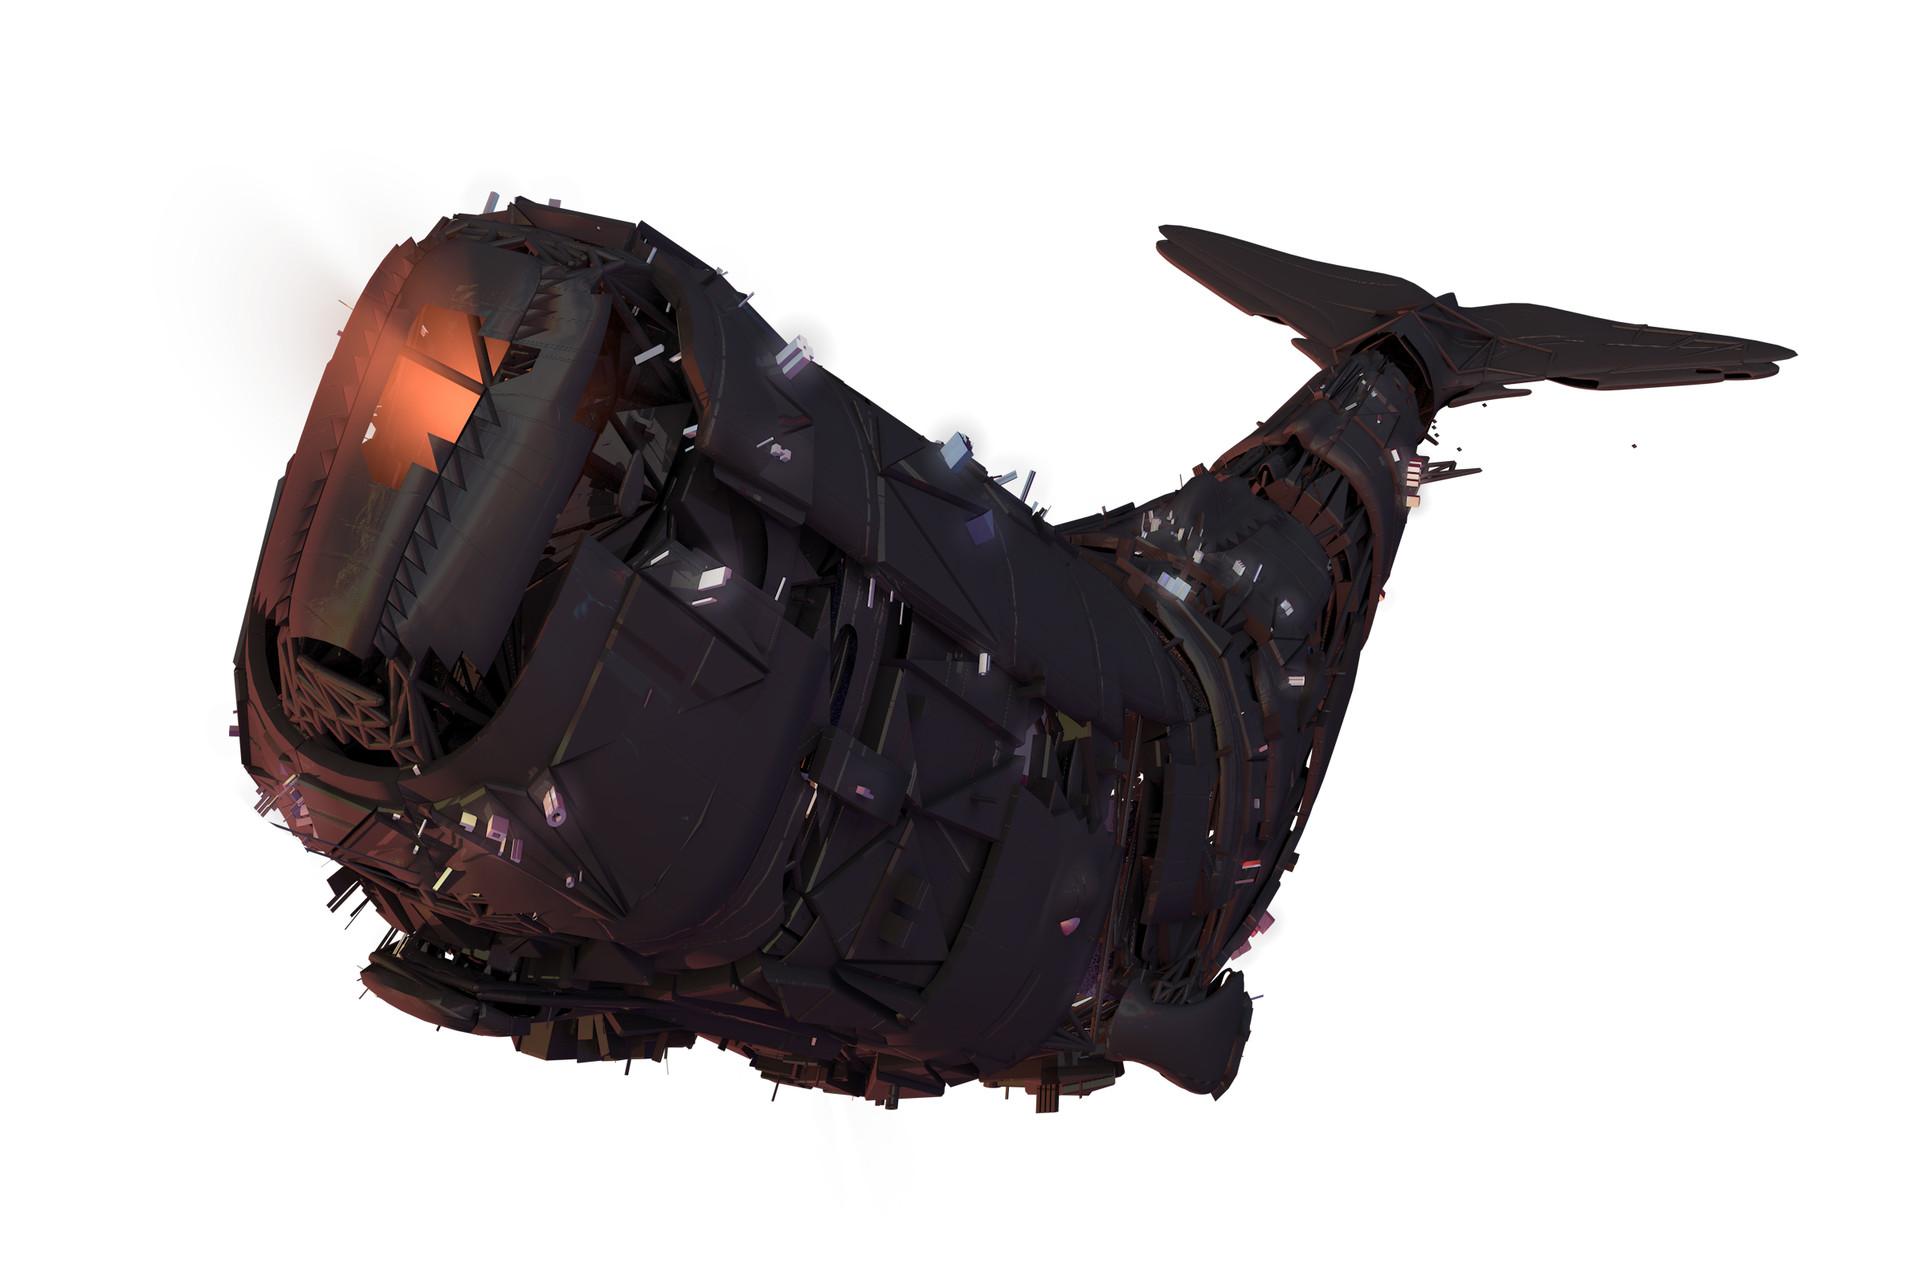 Leon tukker whalemeterorswhale model